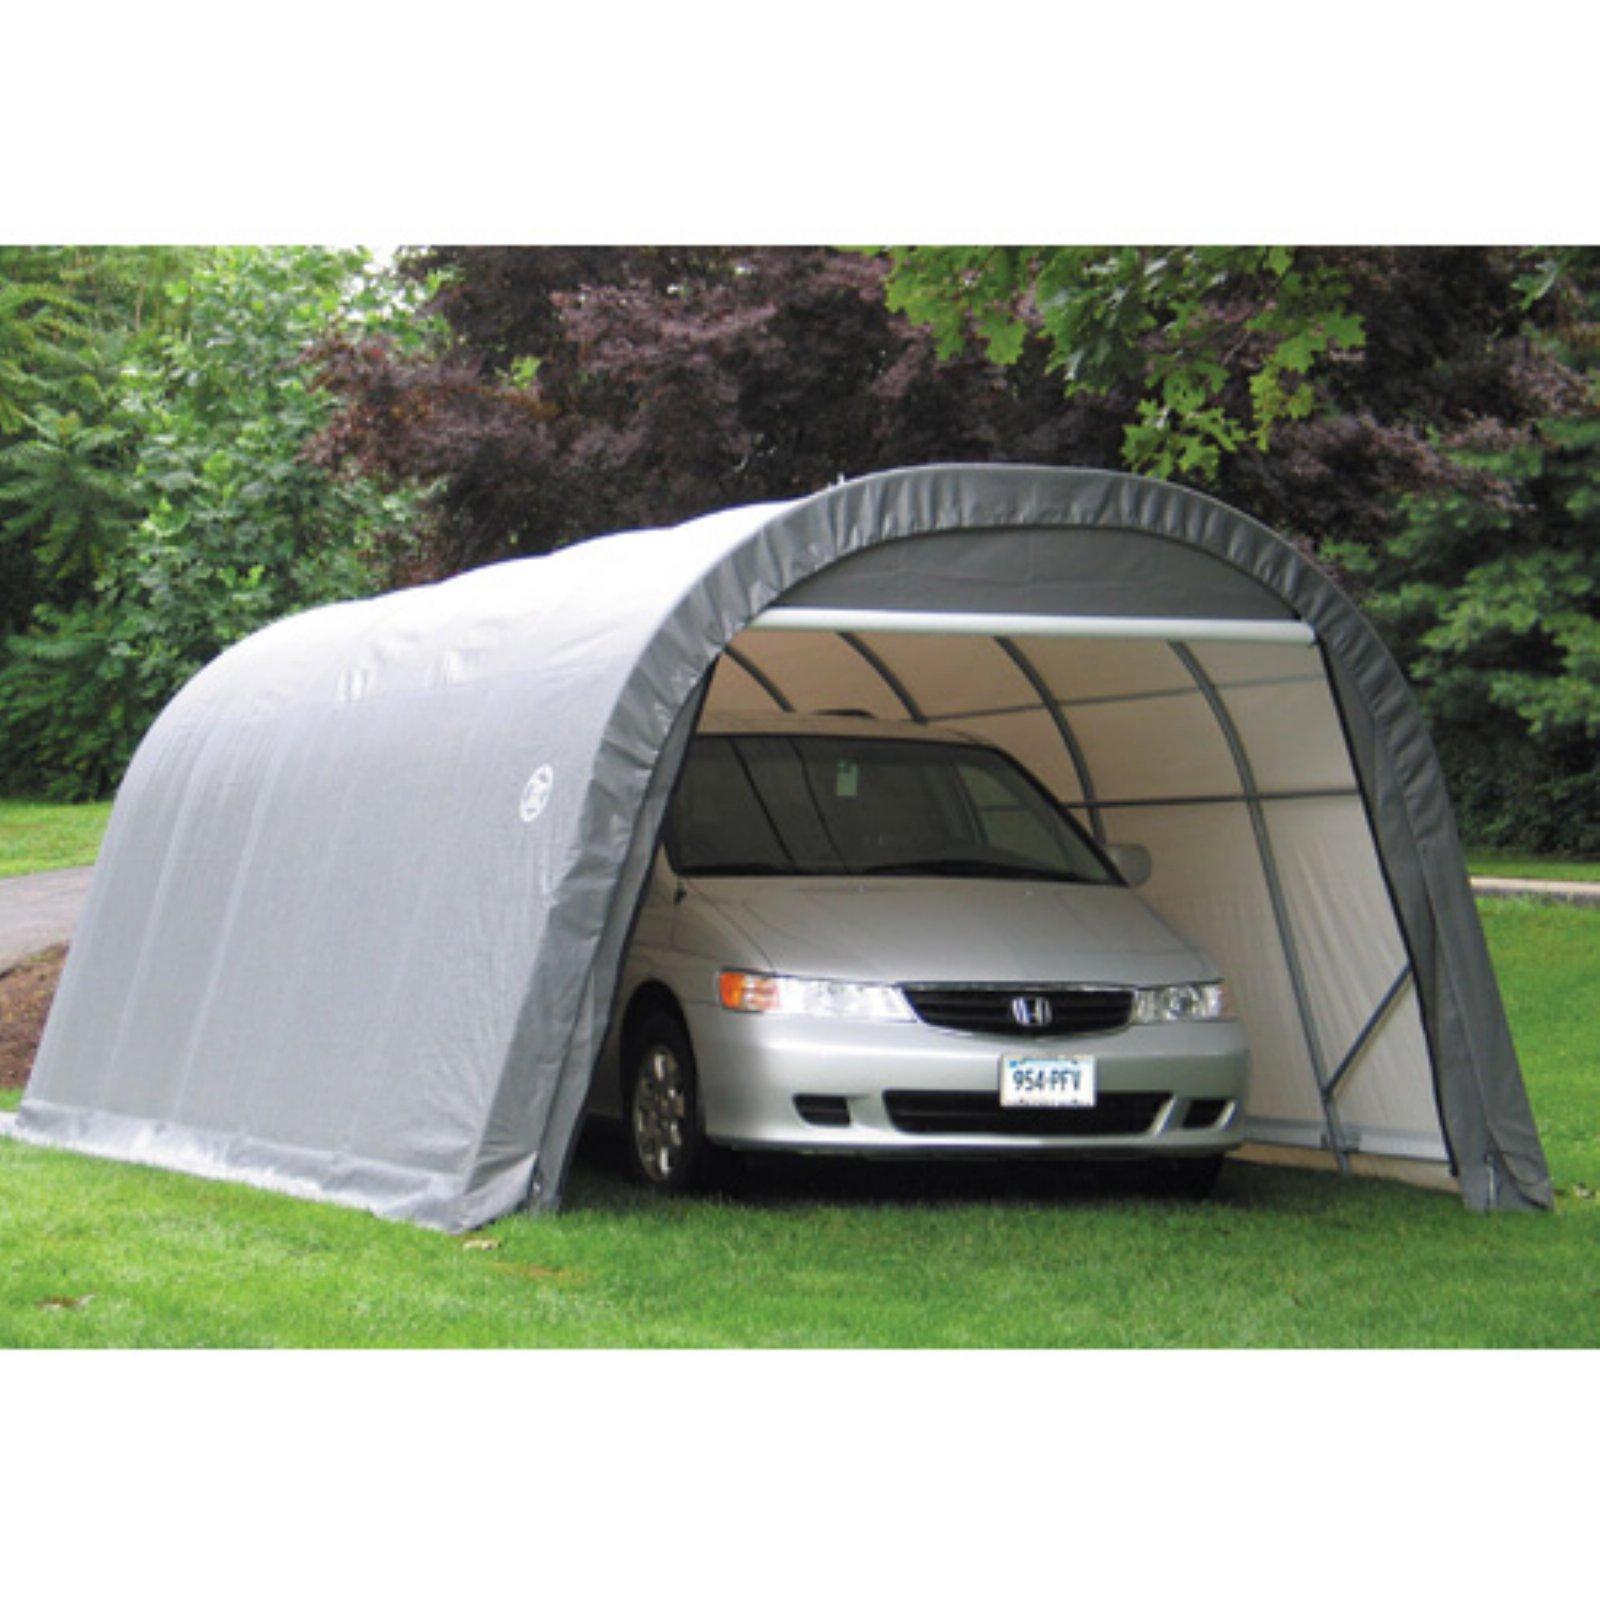 12' x 24' x 8' Round Style Shelter, Green by ShelterLogic